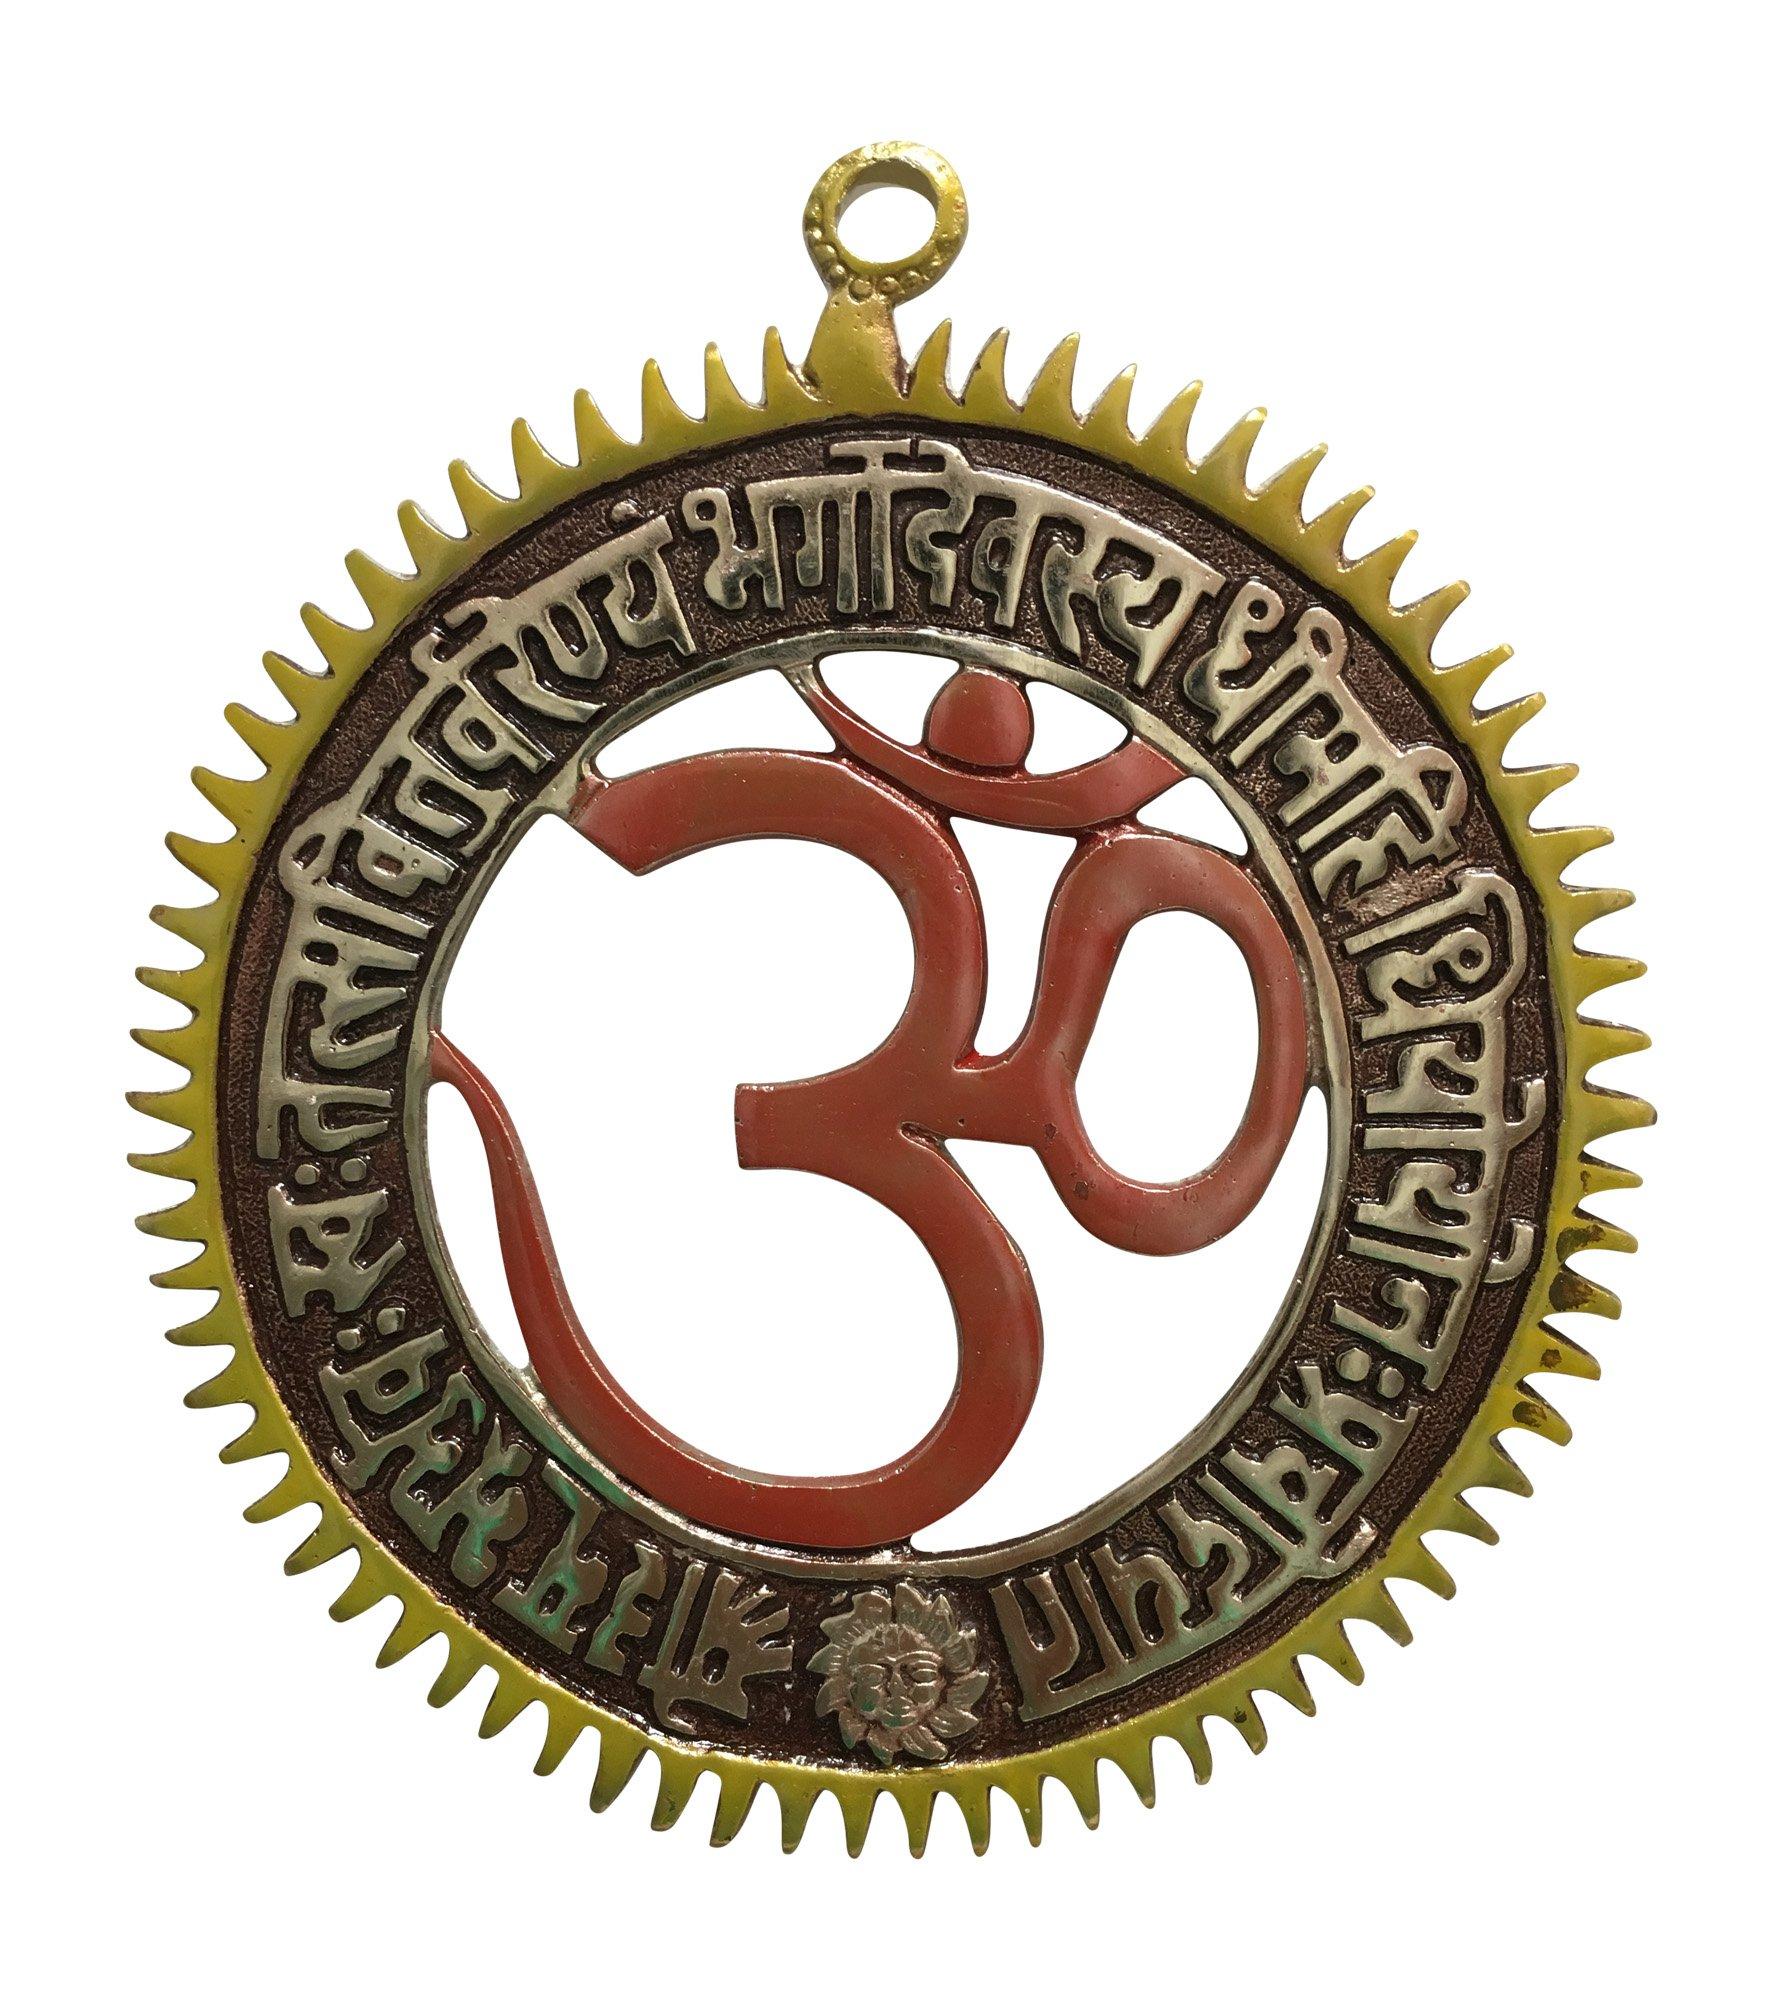 Padma Craft Red and Gold Om/Ohm Gayatri Mantra Vintage Hindu Metal Wall Hanging Plaque